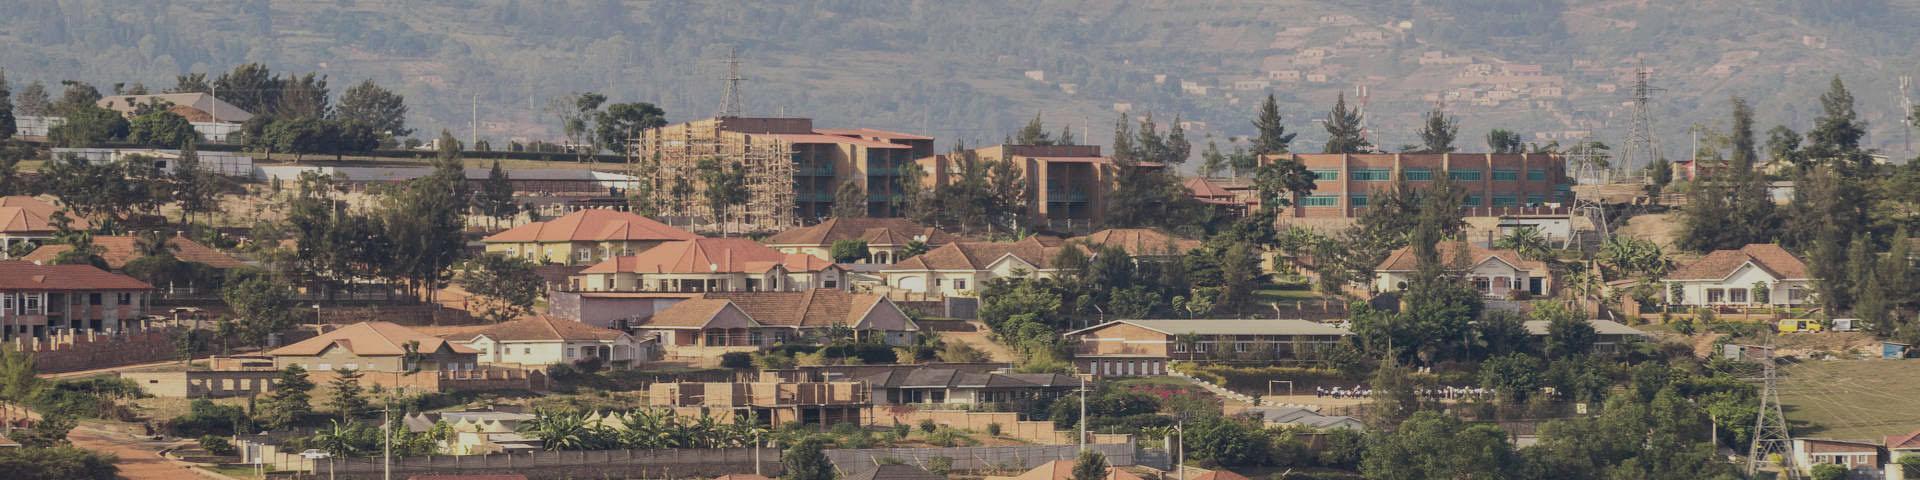 Kigali hero edit